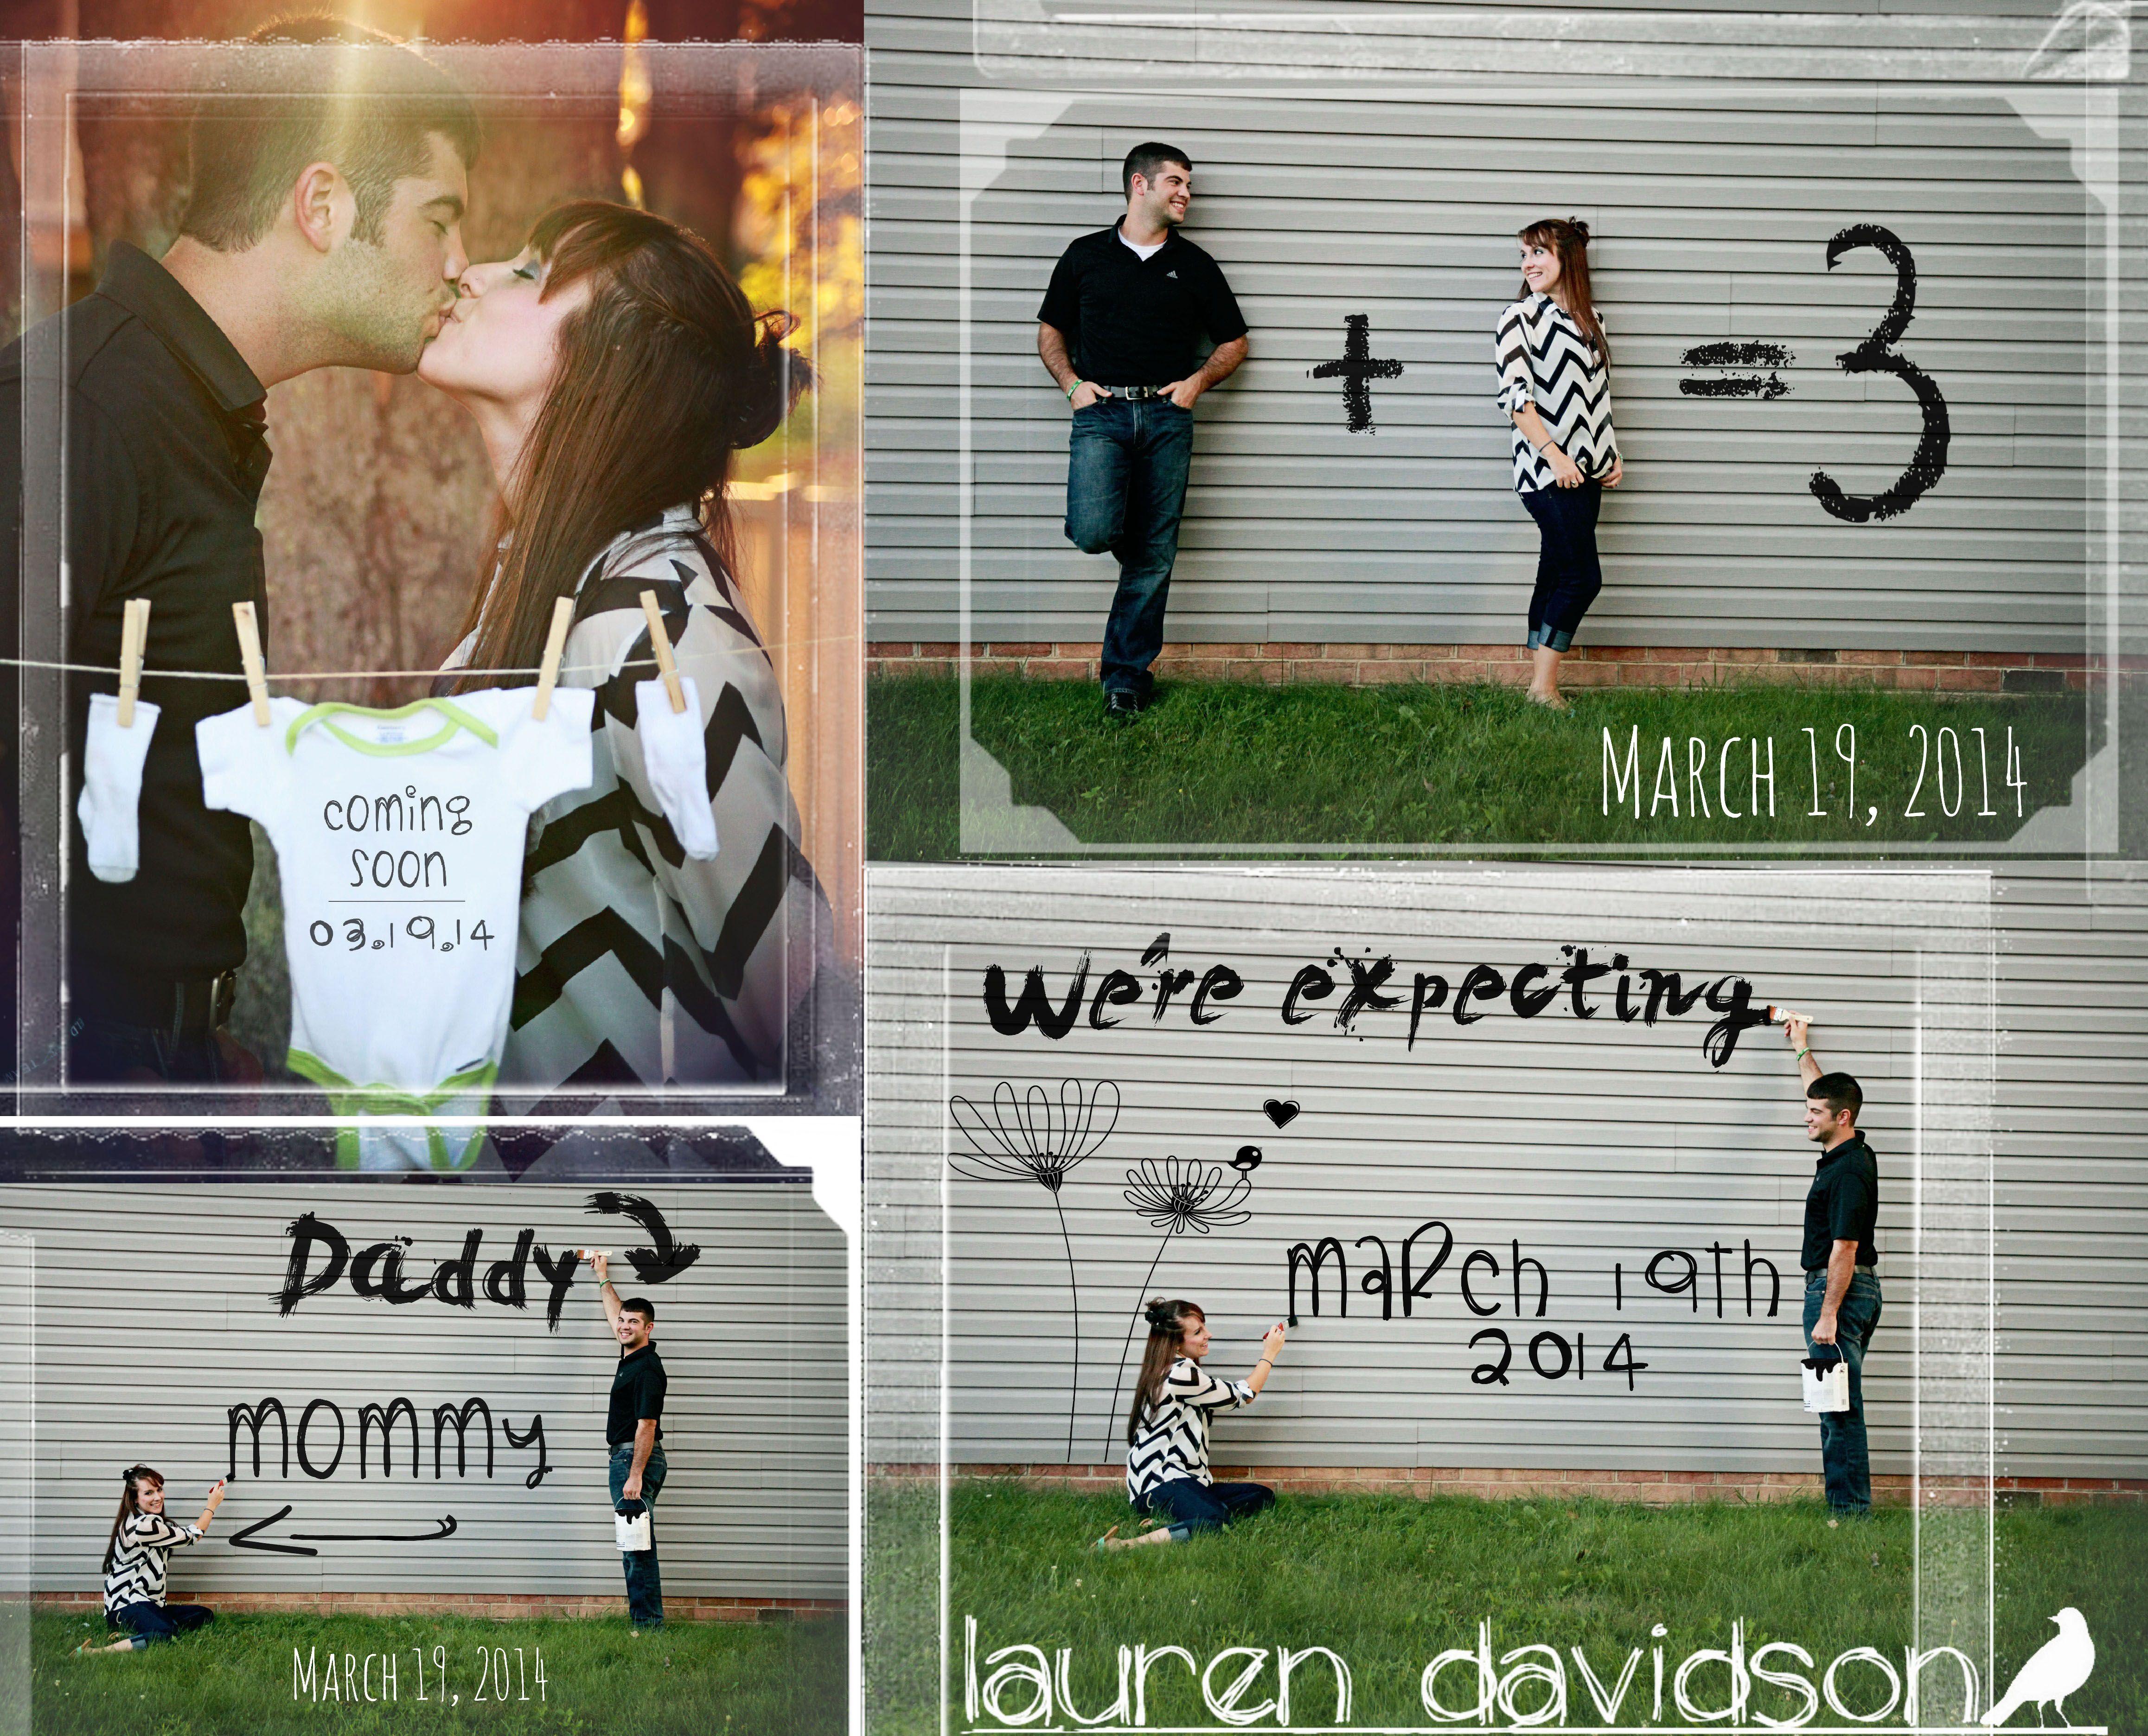 pregnancy reveal photo ideas  1 1 3  painting  u0026quot we u0026 39 re